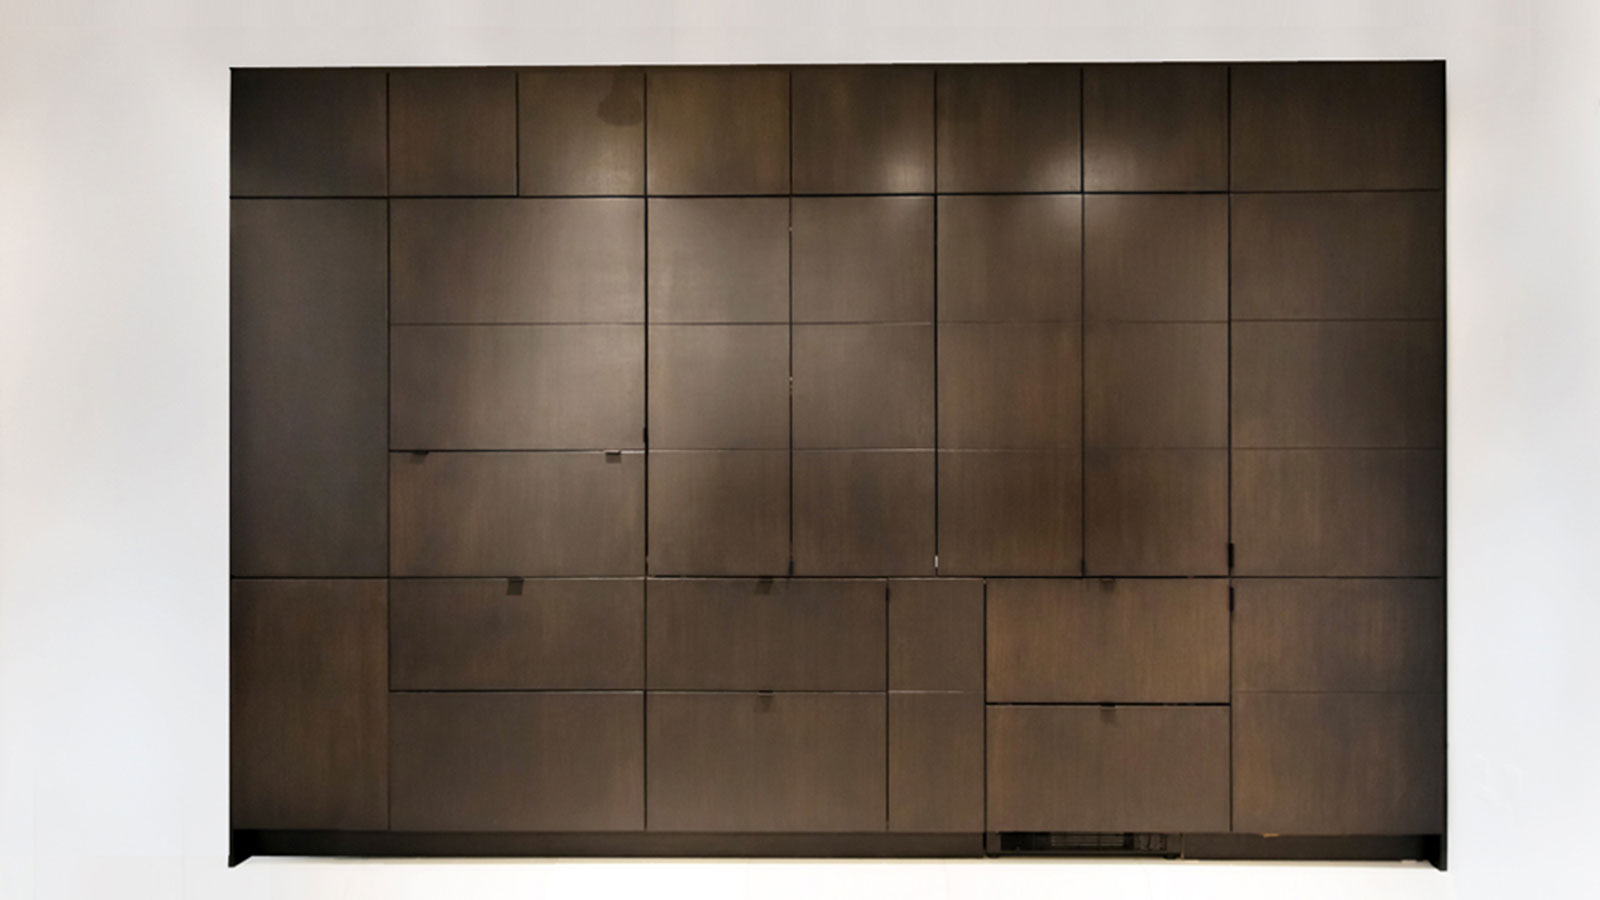 Stealth-Kitchen-with-Dark-Finish-Closed